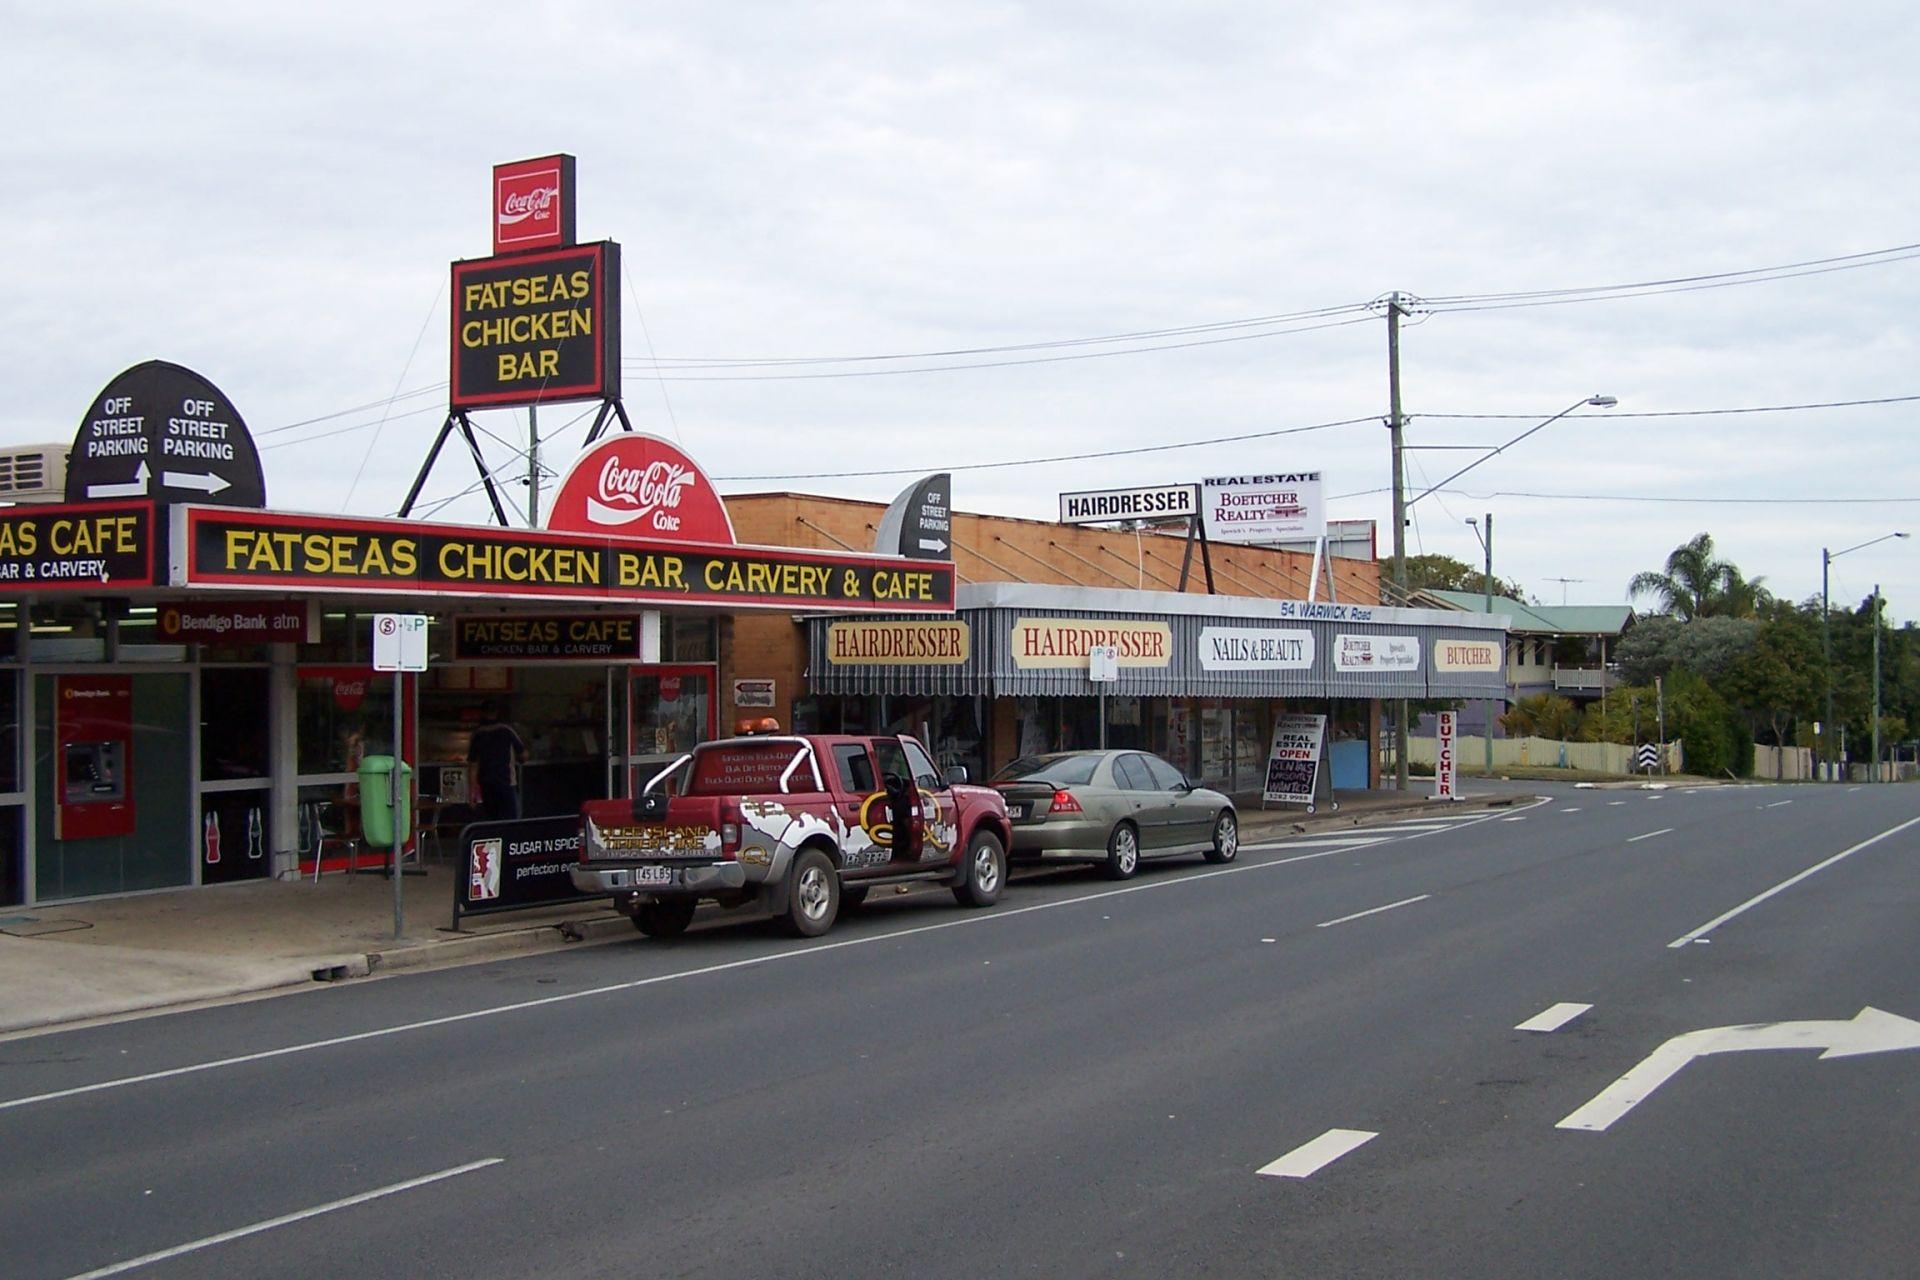 Prime Corner Location And Plenty Of Parking